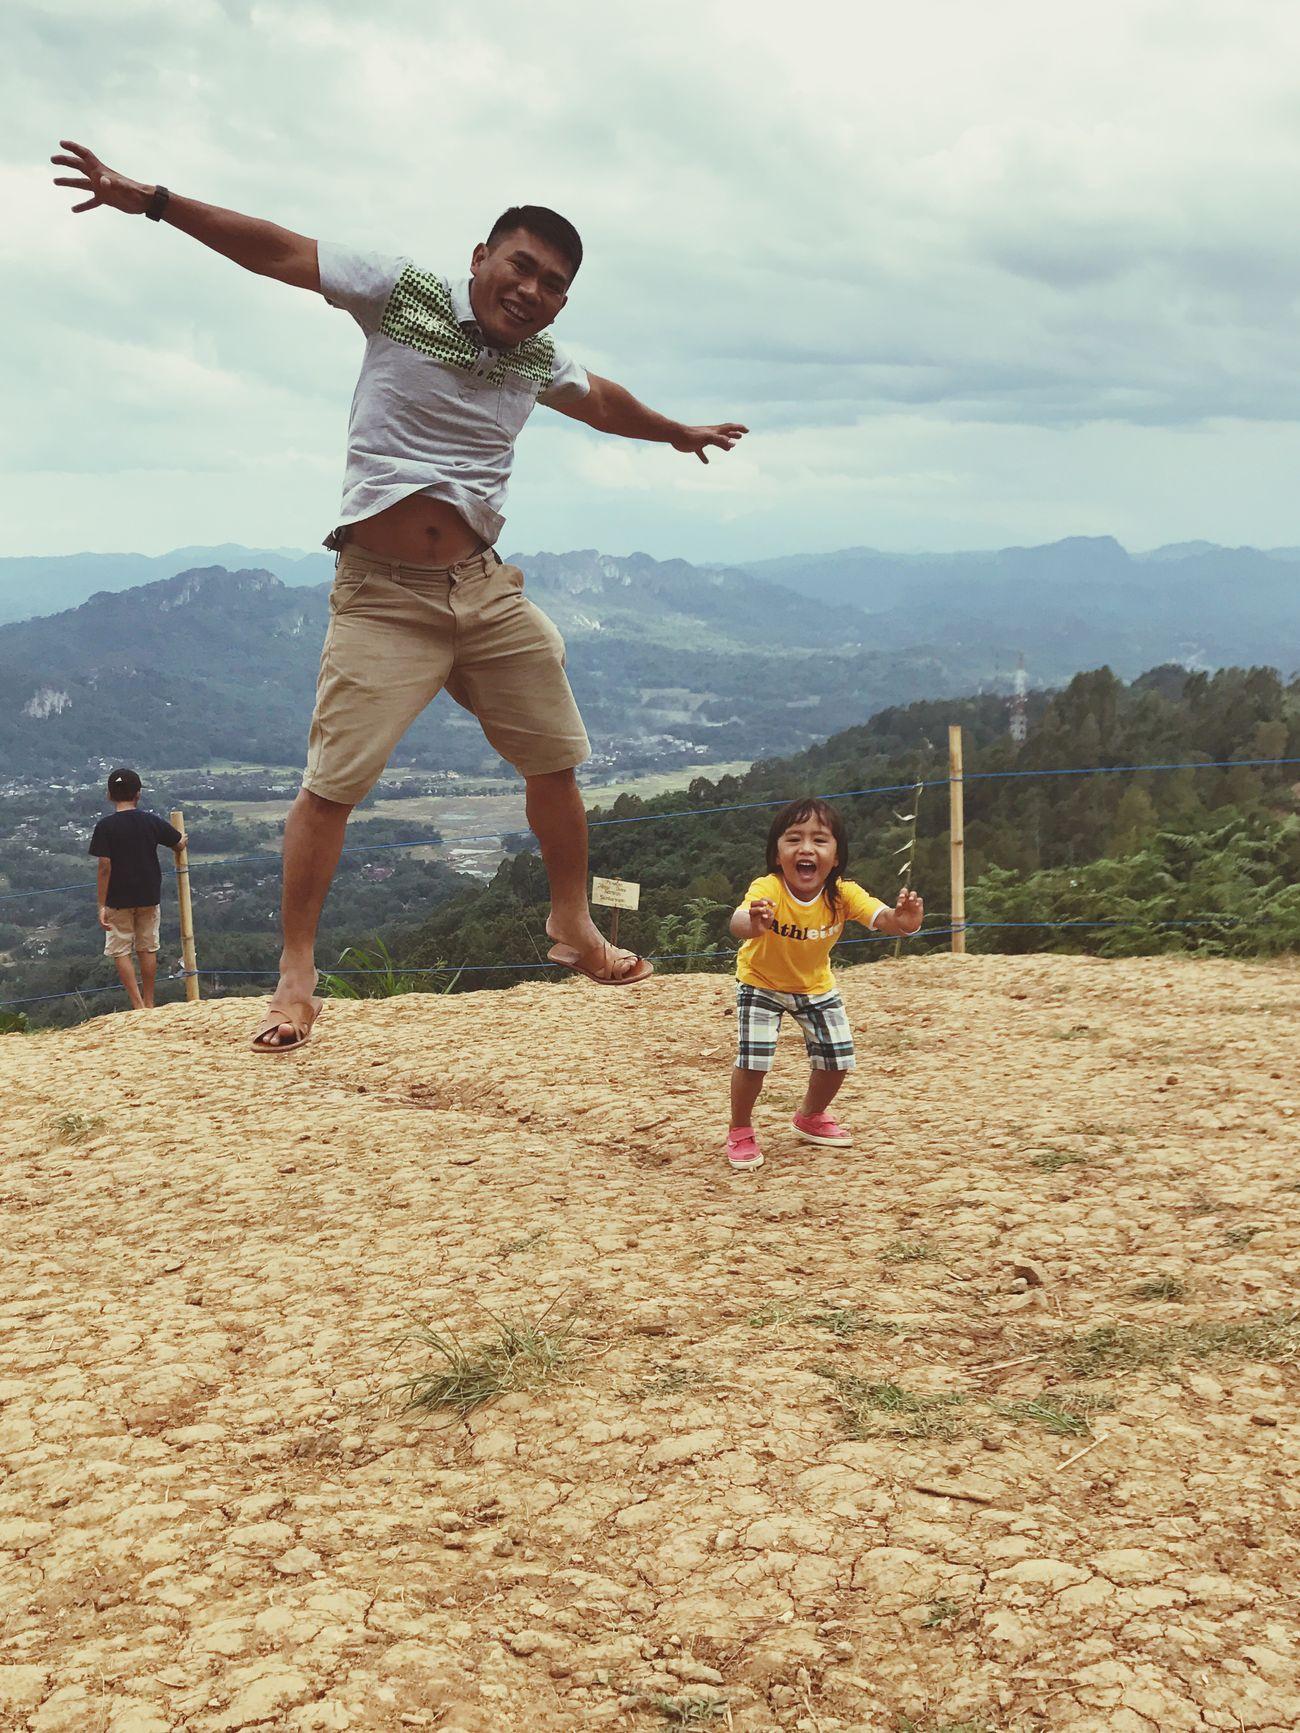 Jumping Sky Landscape Nature Negeridiatasawan Toraja Toraja Utara